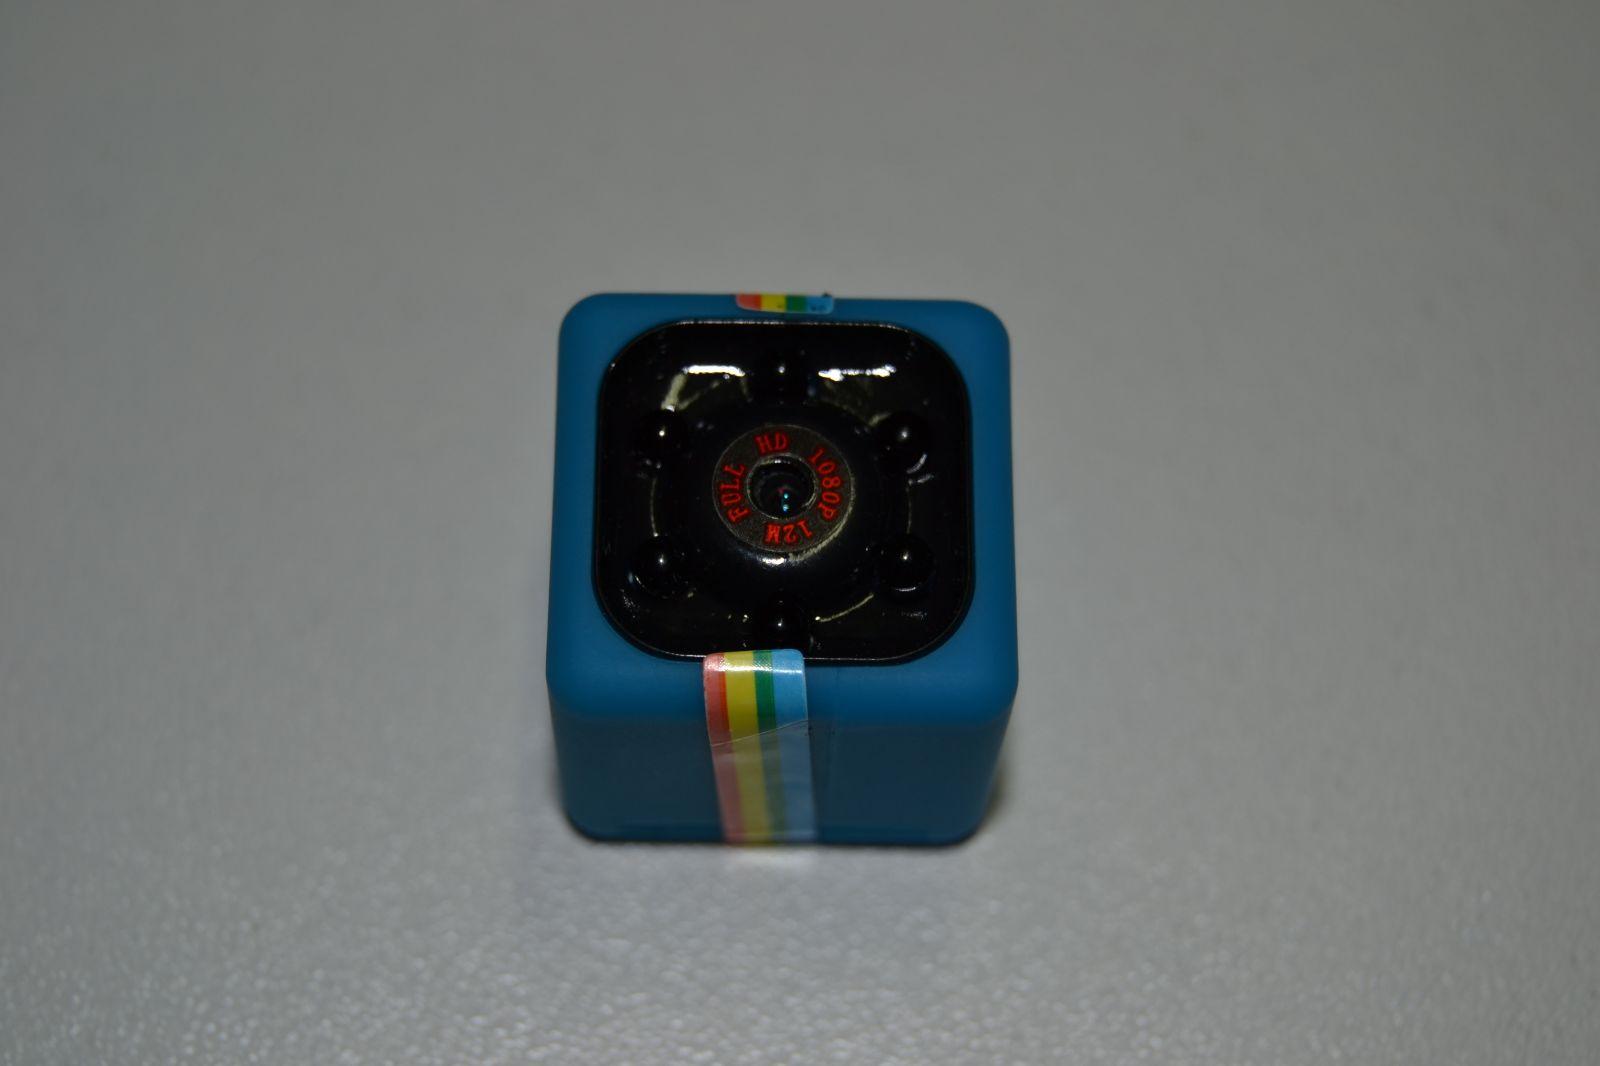 Cop cam - security camera, mikrokamera